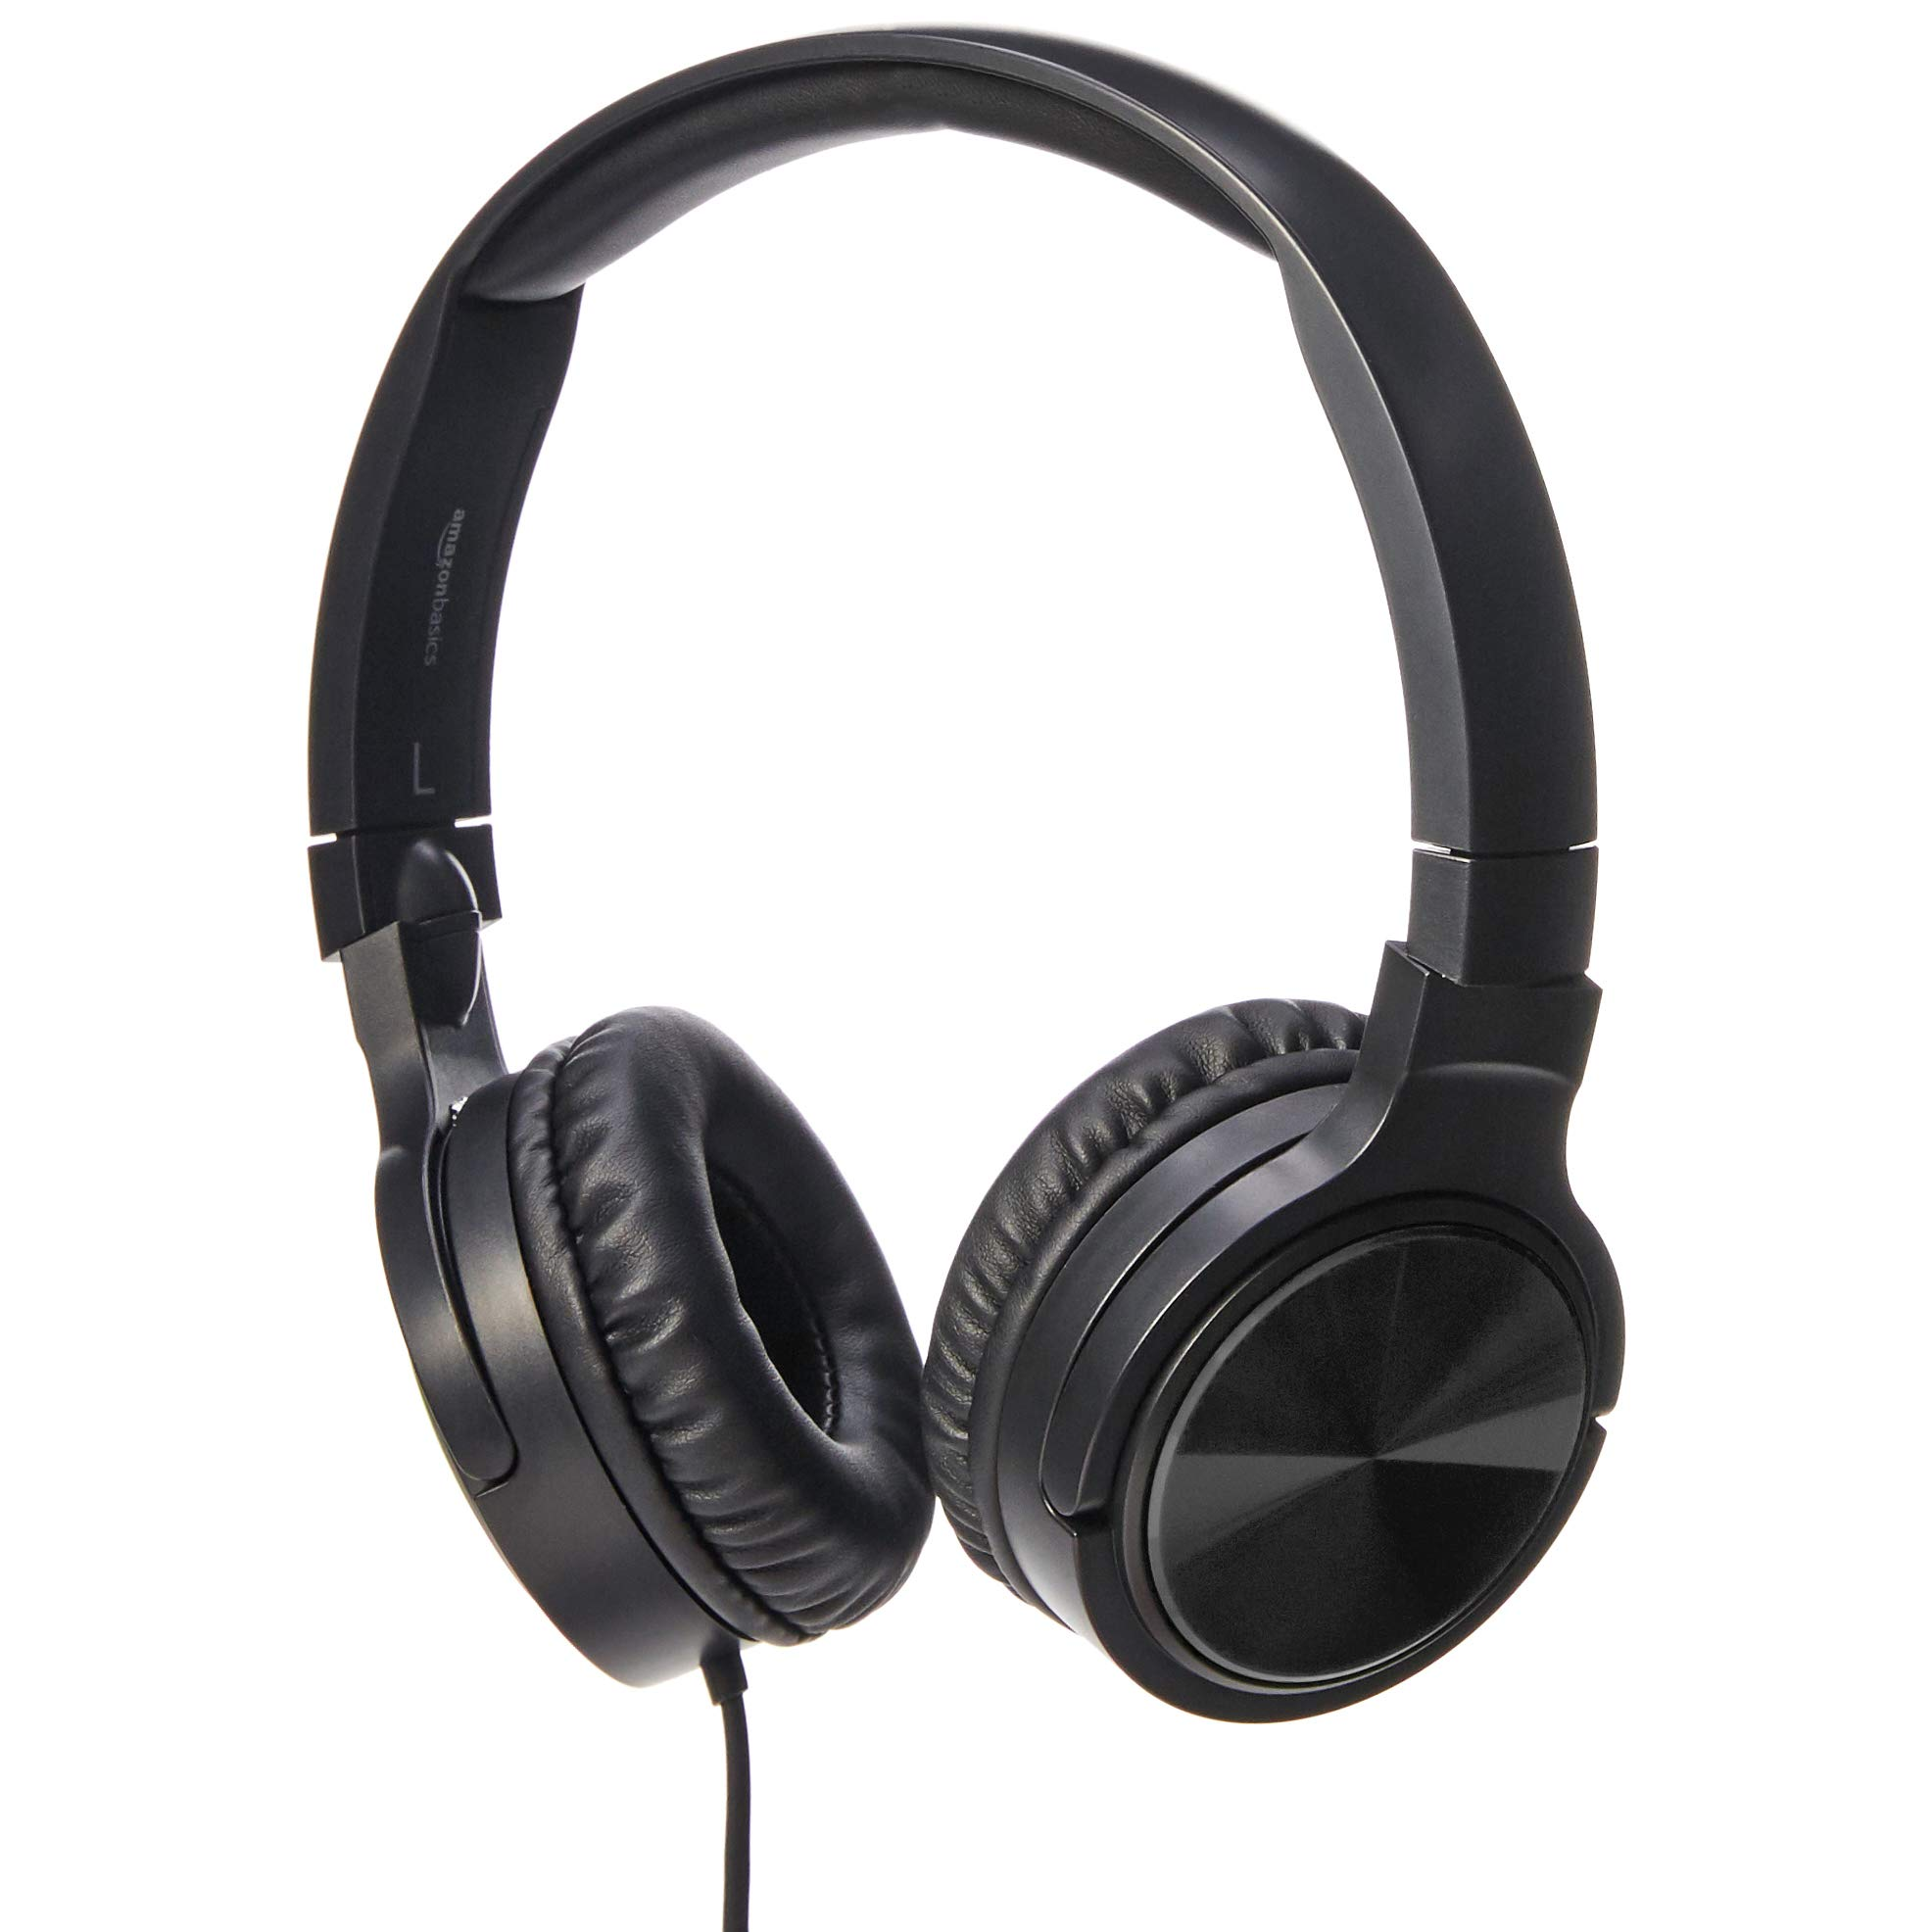 AmazonBasics Lightweight On-Ear Wired Headphones, Black by AmazonBasics